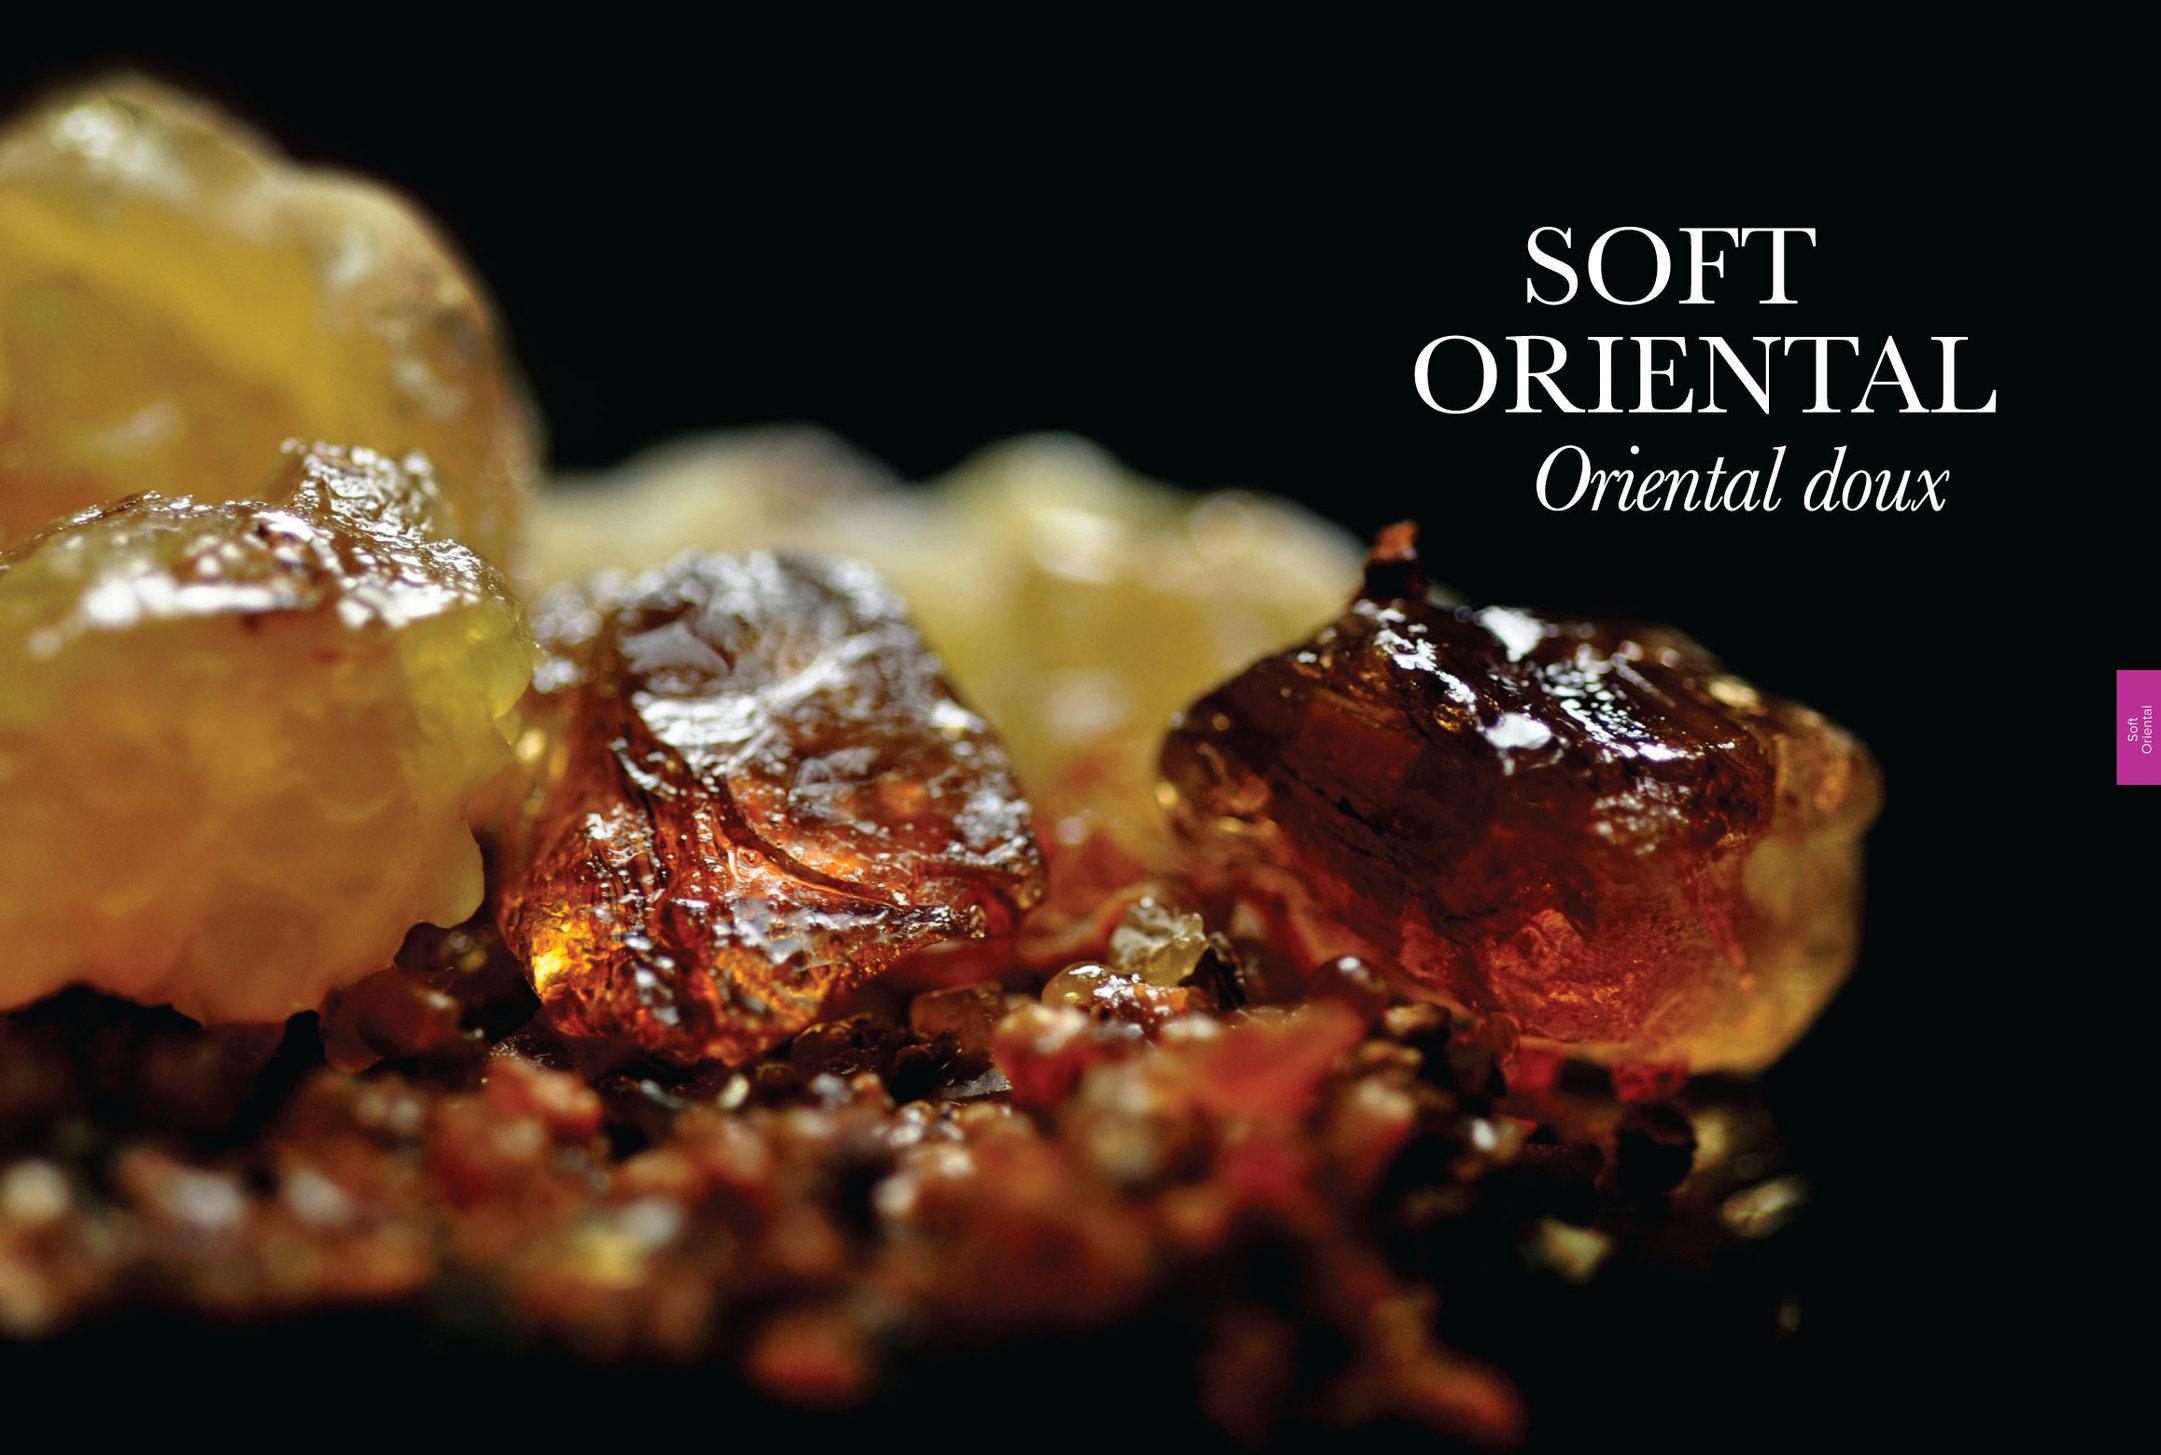 Soft-Oriental.jpg